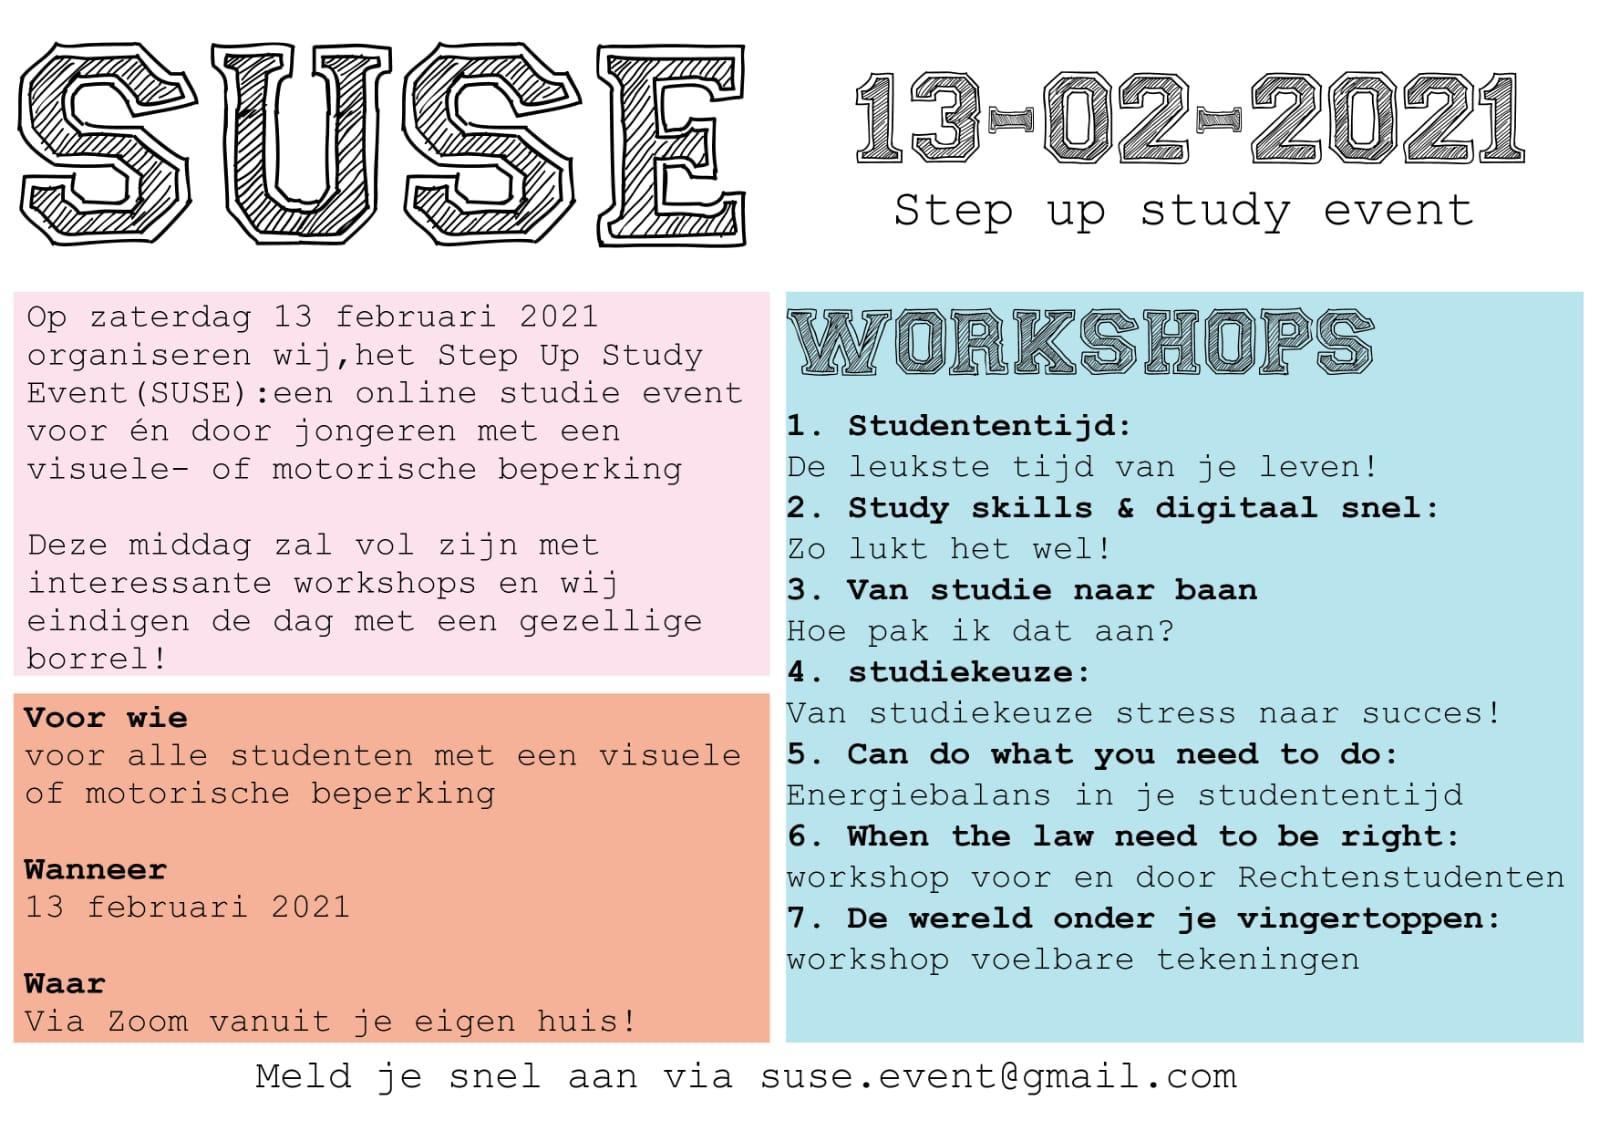 step up study event